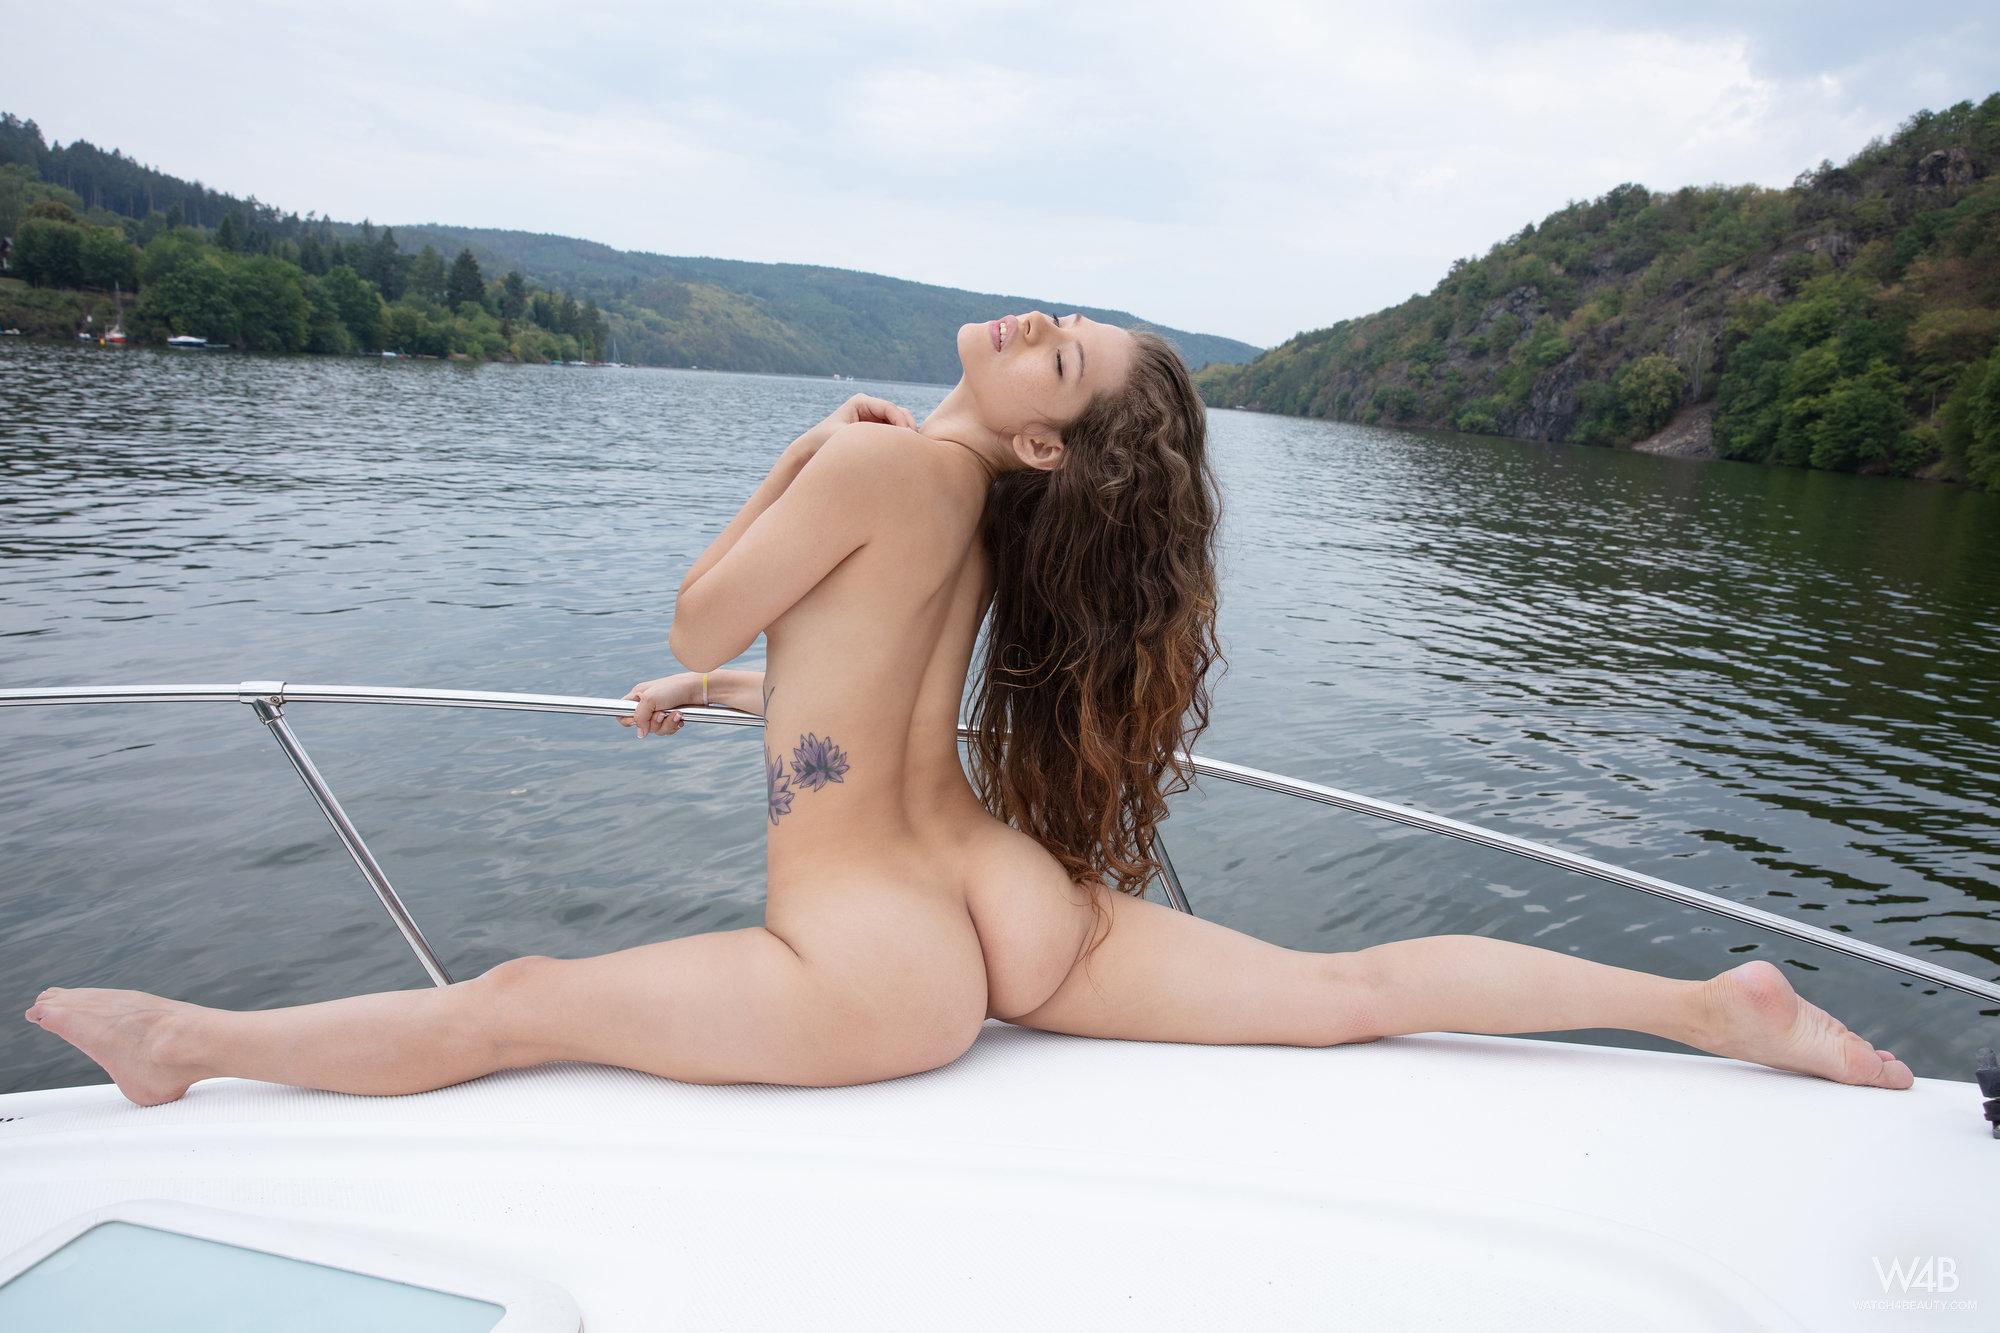 flexible-nude-girls-gymnast-splits-fetish-mix-vol2-93